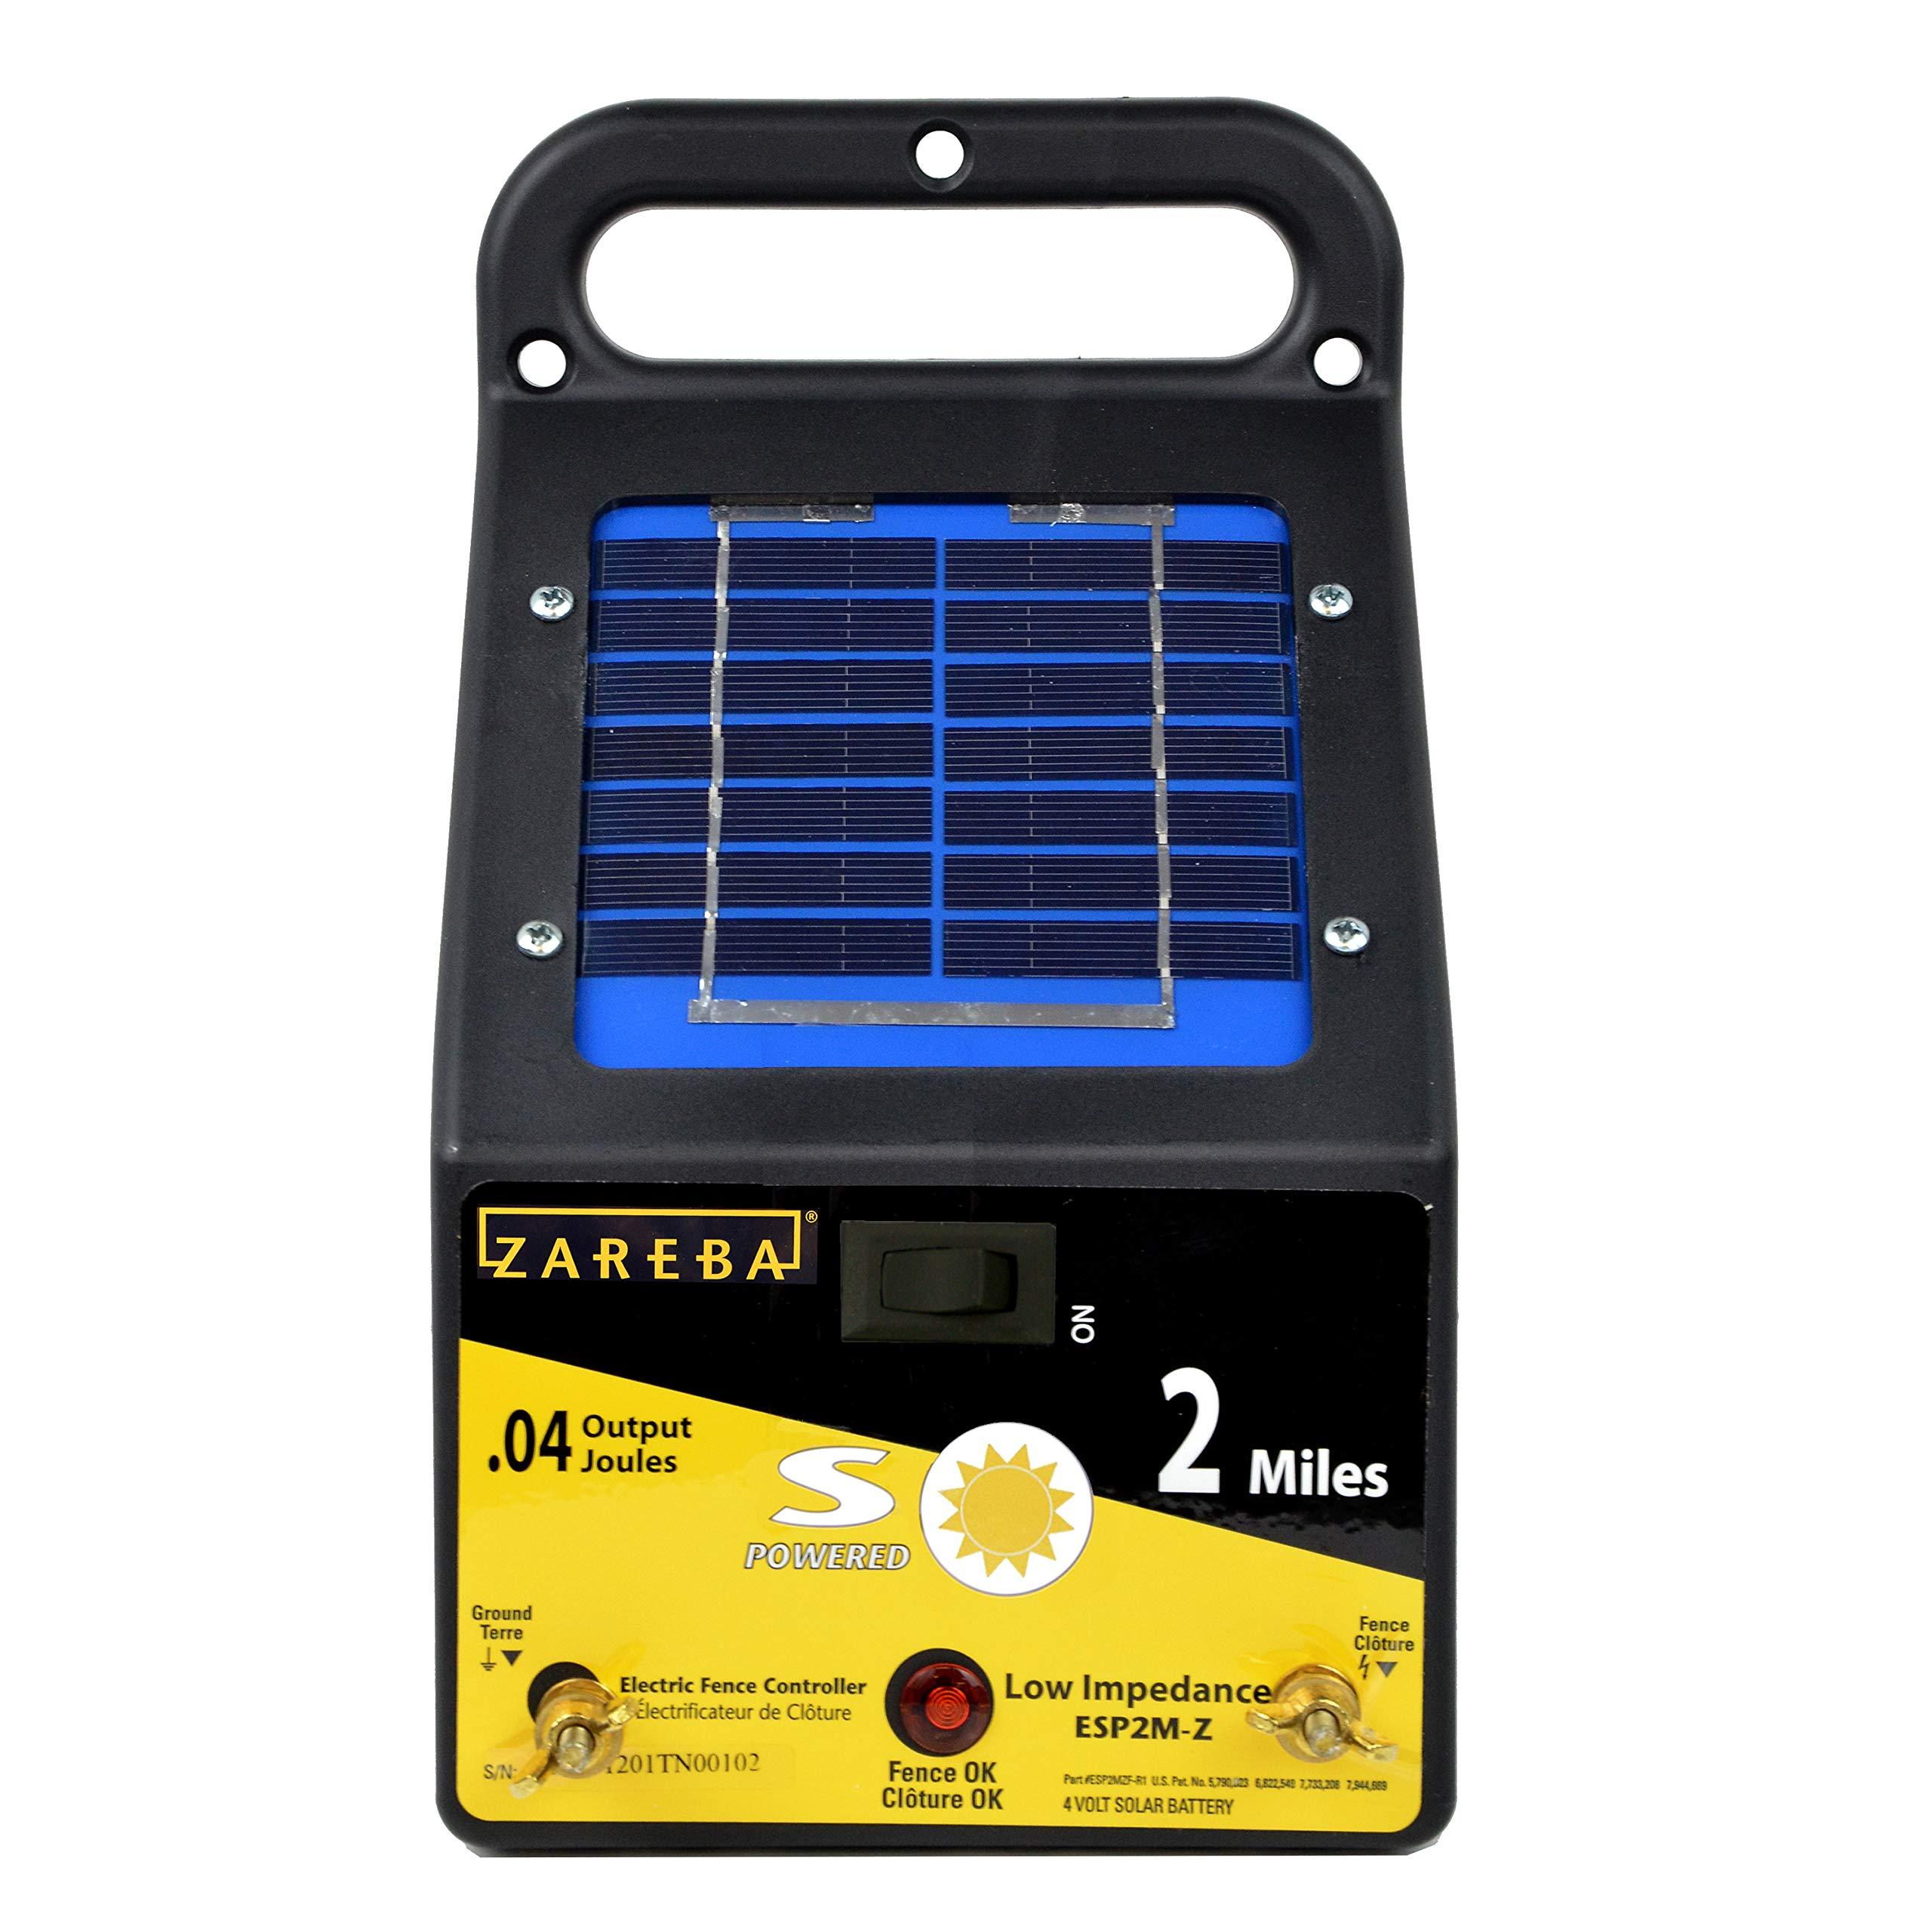 Zareba ESP2M-Z 2-Mile Solar Low Impedance Electric Fence Charger by Zareba